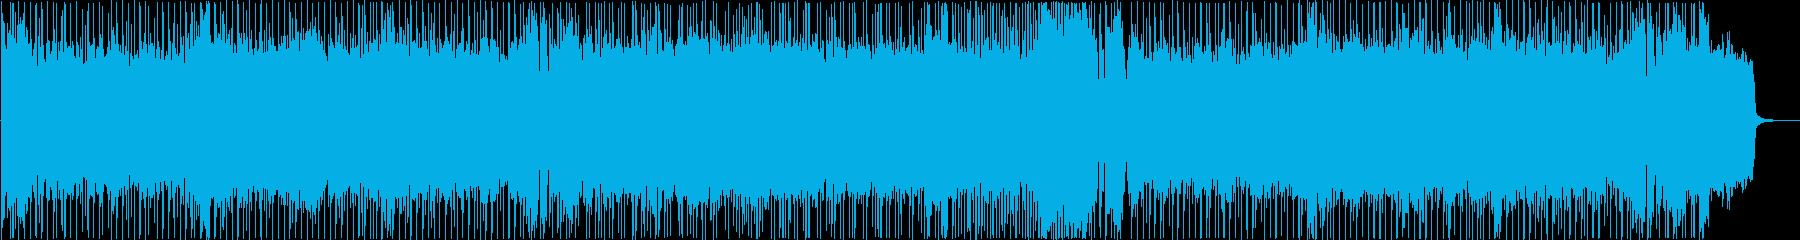 RPGの強敵とバトルする時に流れるBGMの再生済みの波形